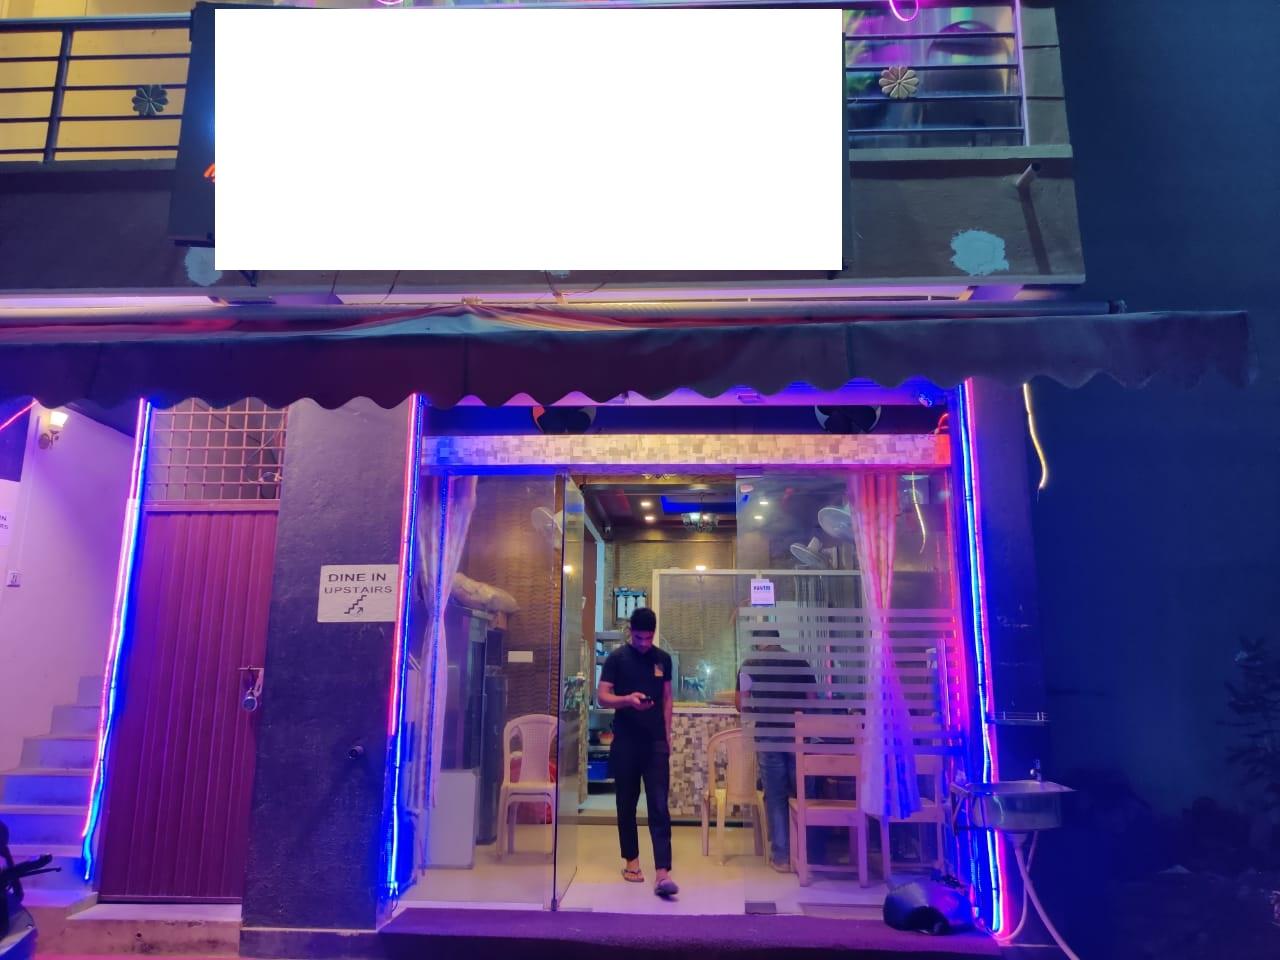 North Indian Restaurant in Highvalue Prime Location